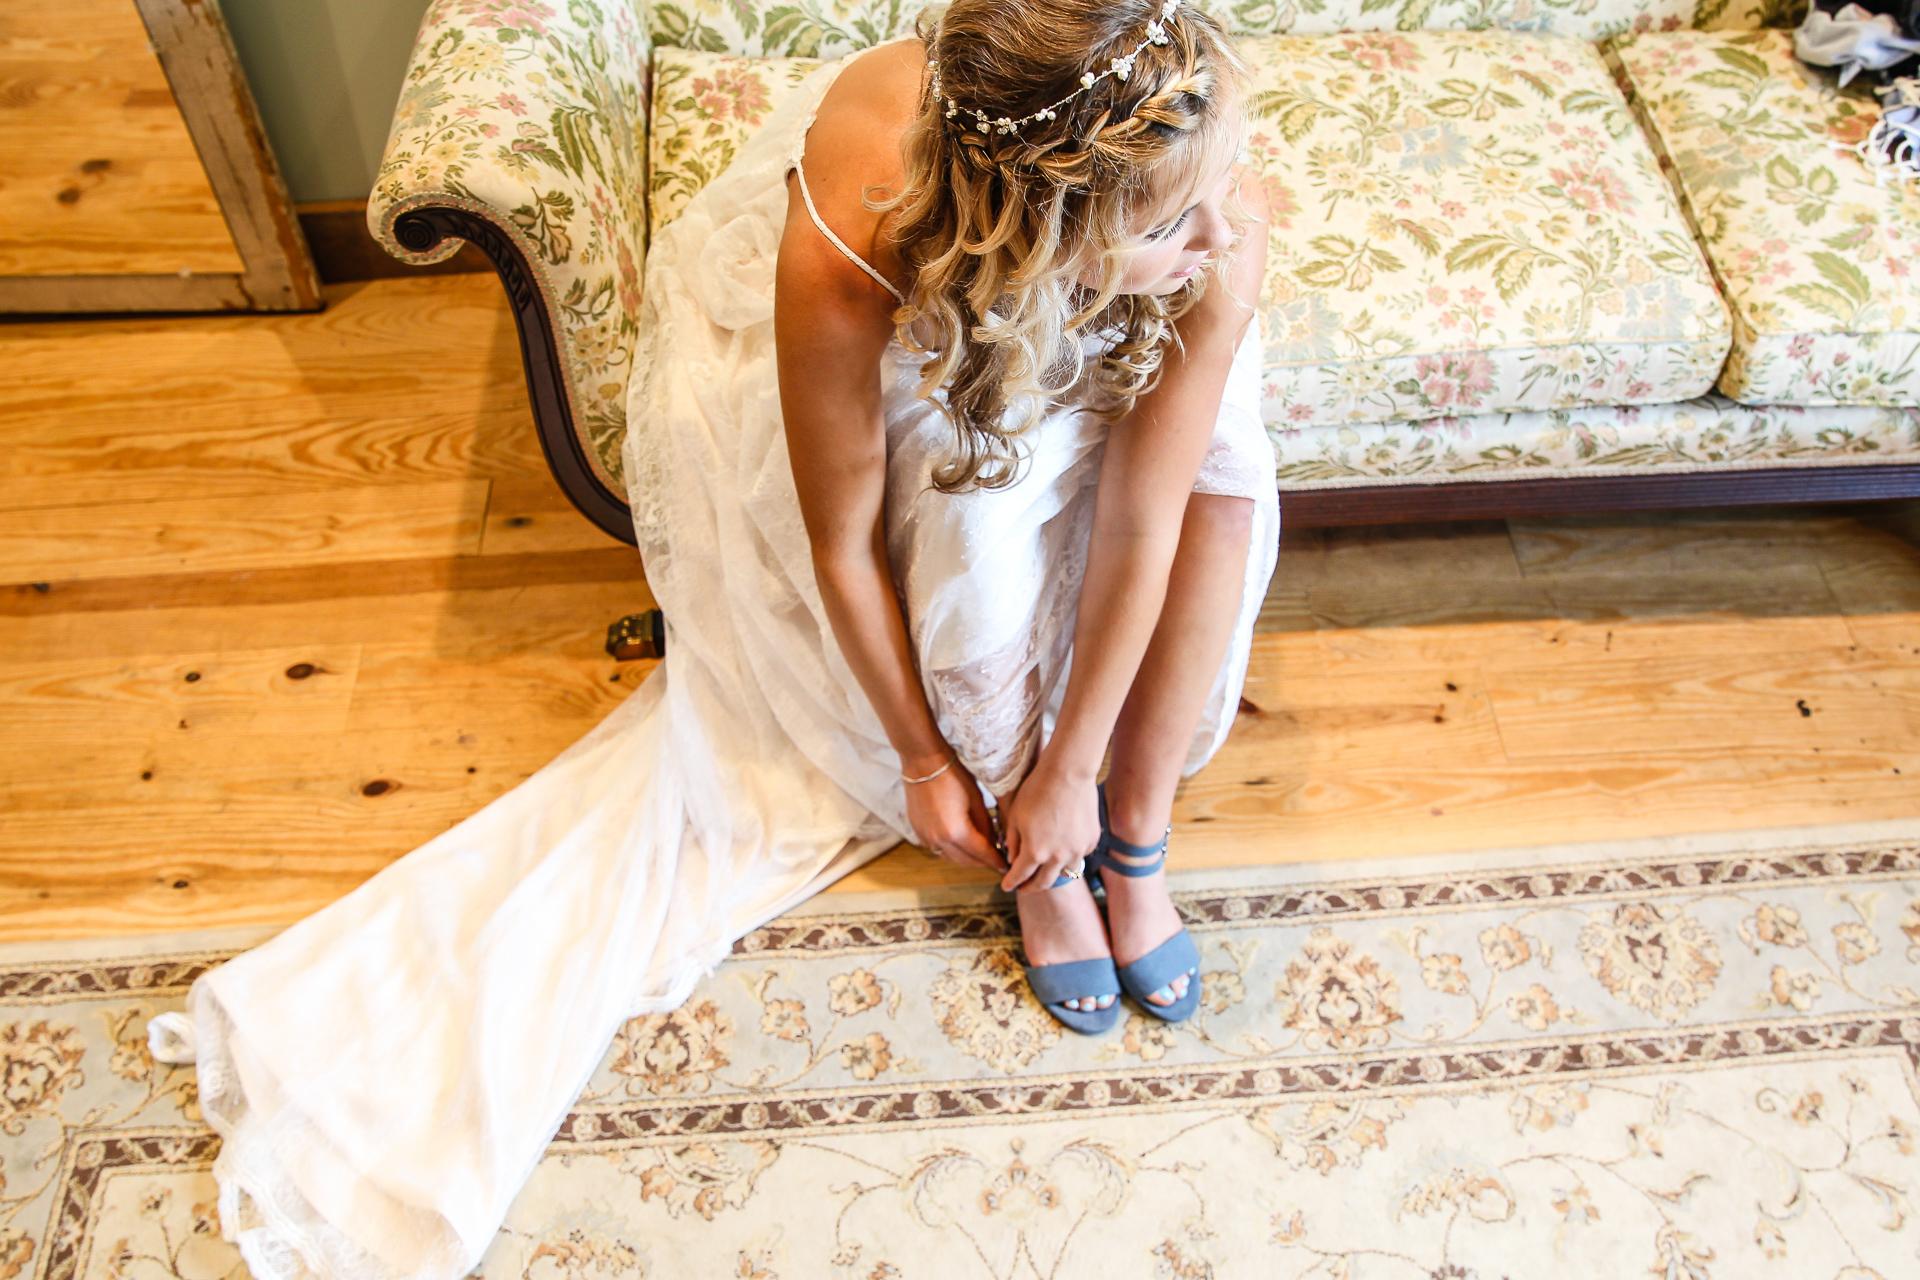 Jordan + Kevin Wedding On Sunny Slope Farm Wedding Venue by Linda Hexter Photography (10 of 30)